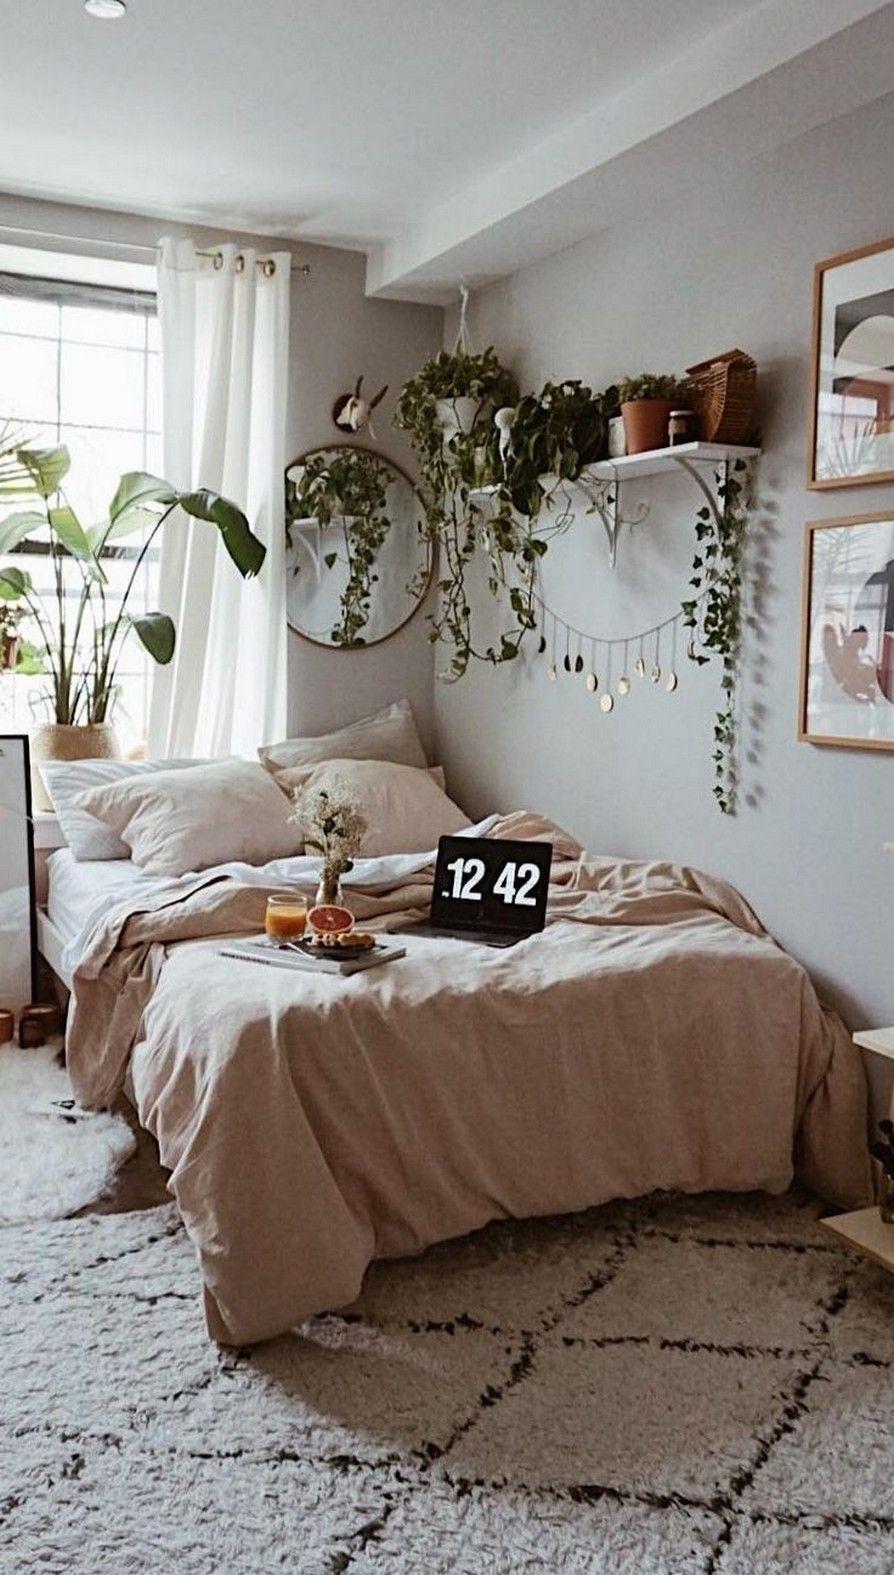 34+ discover ideas about bedroom plants decor 8 « Home Decor